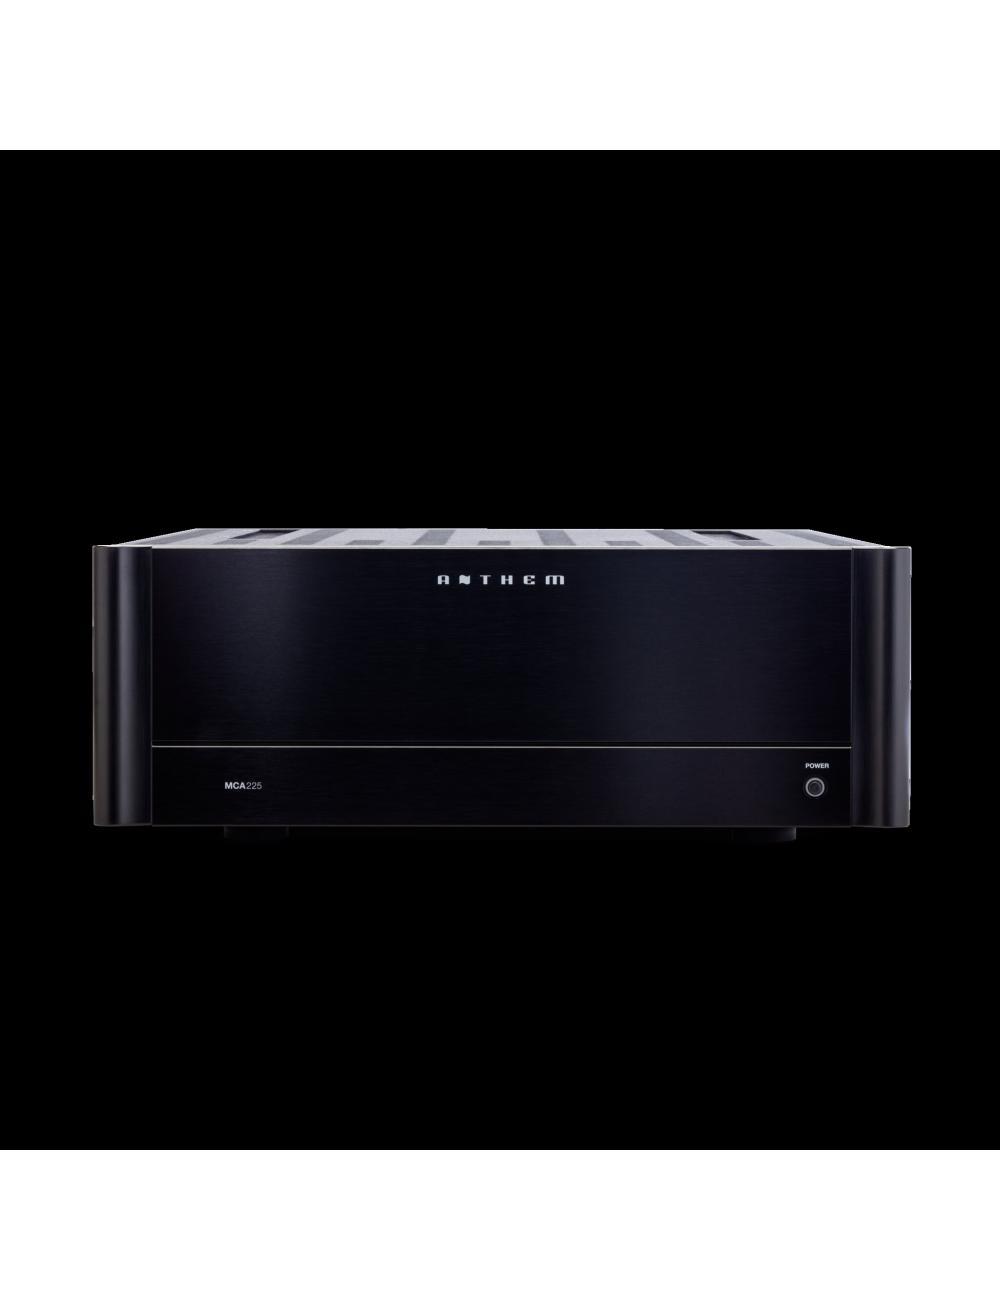 amplificatore di potenza a tre canali, Anthem MCA 225, vista frontale